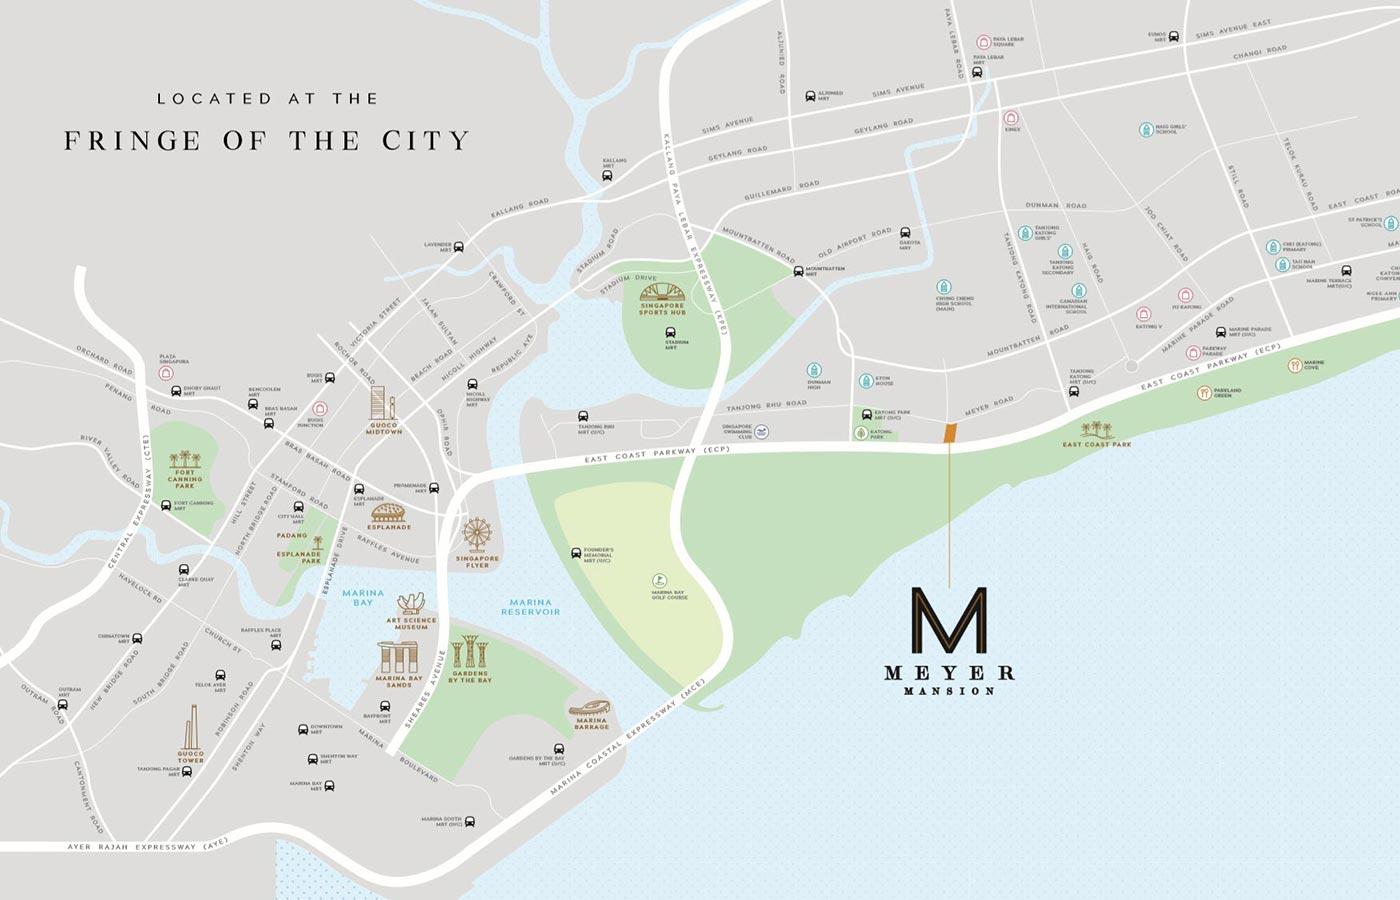 Meyer-Mansion-Condo-Location-Map